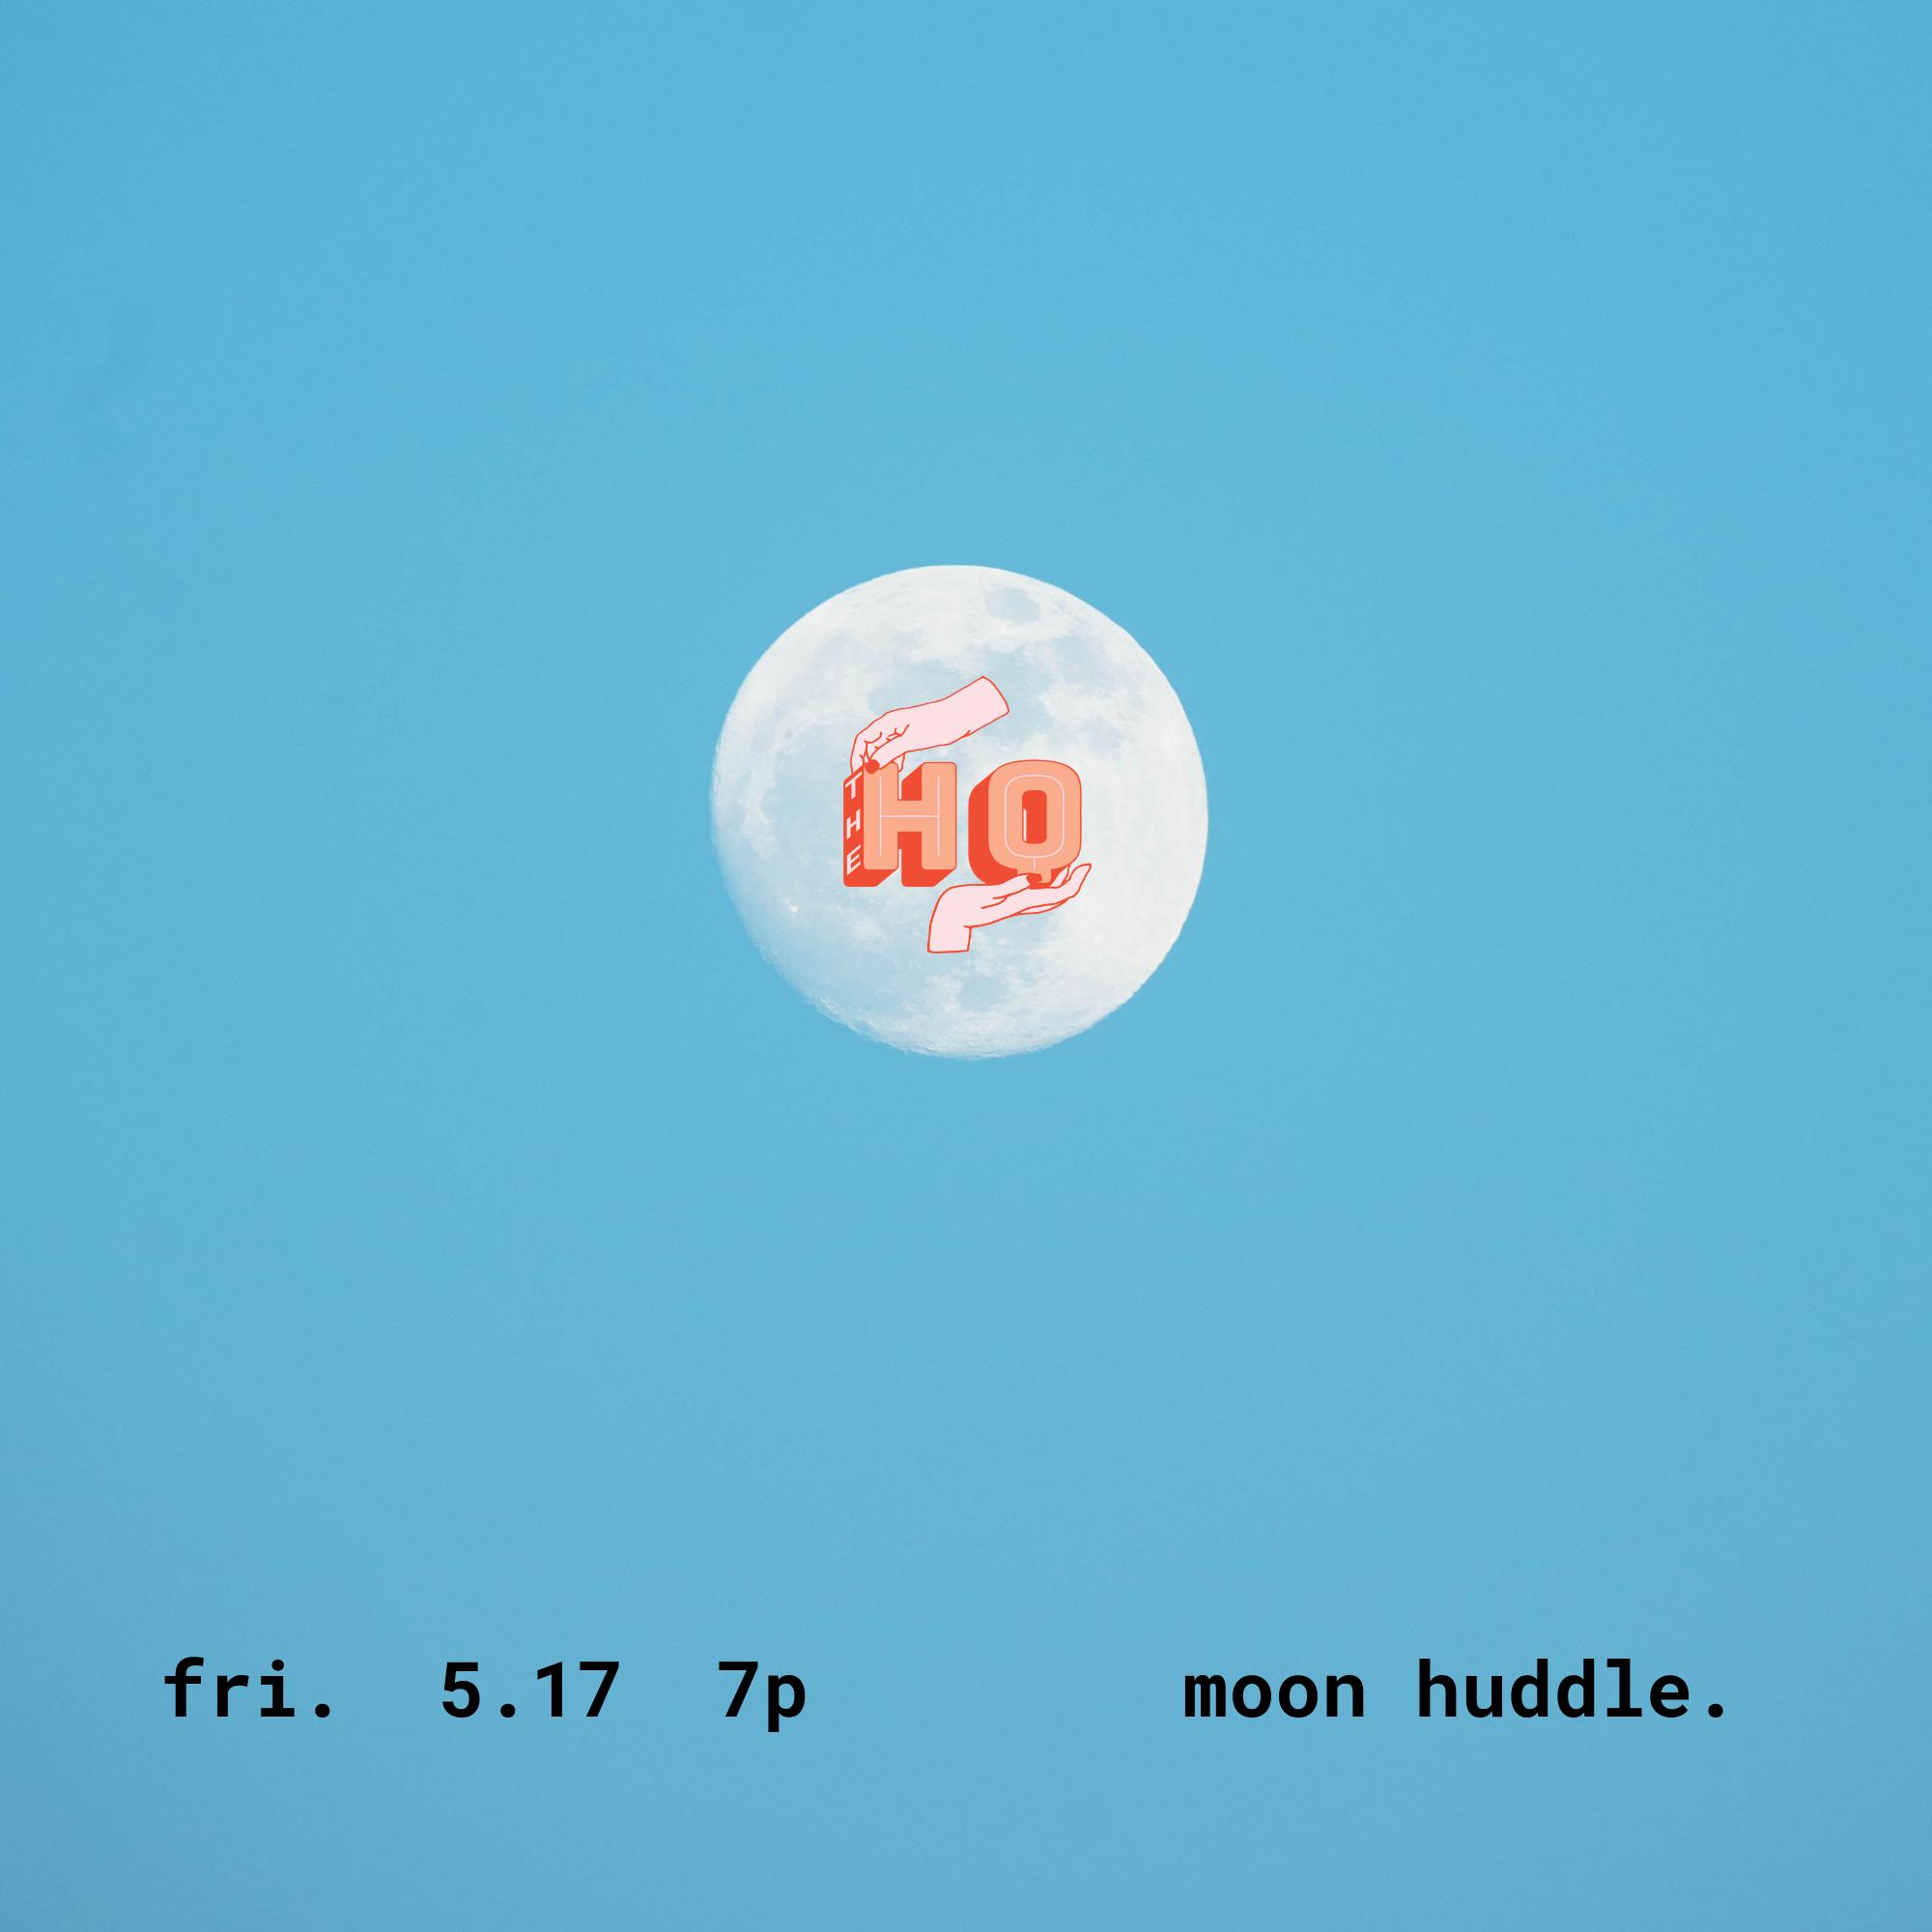 moon huddle ig.png